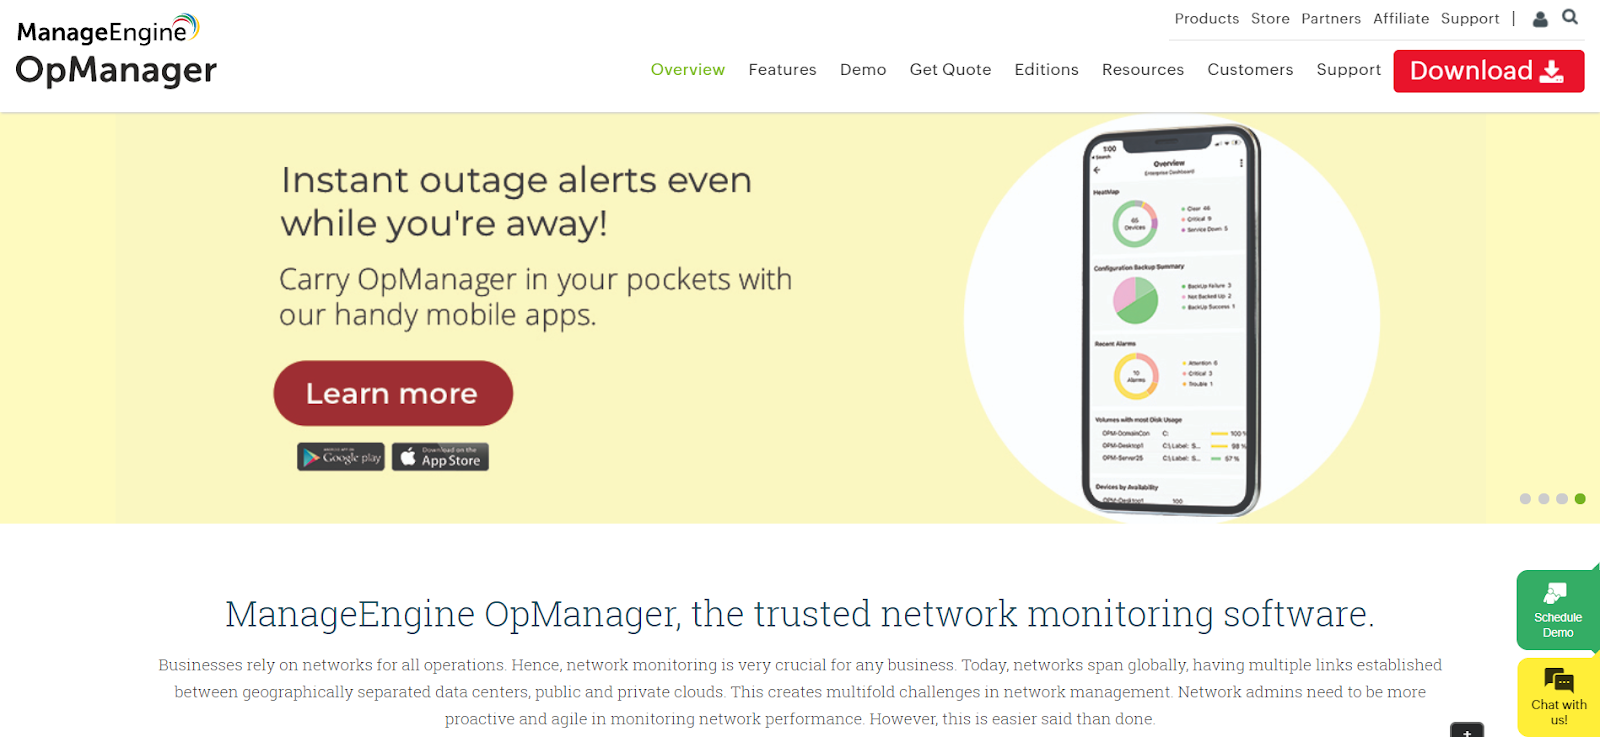 ManageEngine Server monitoring software